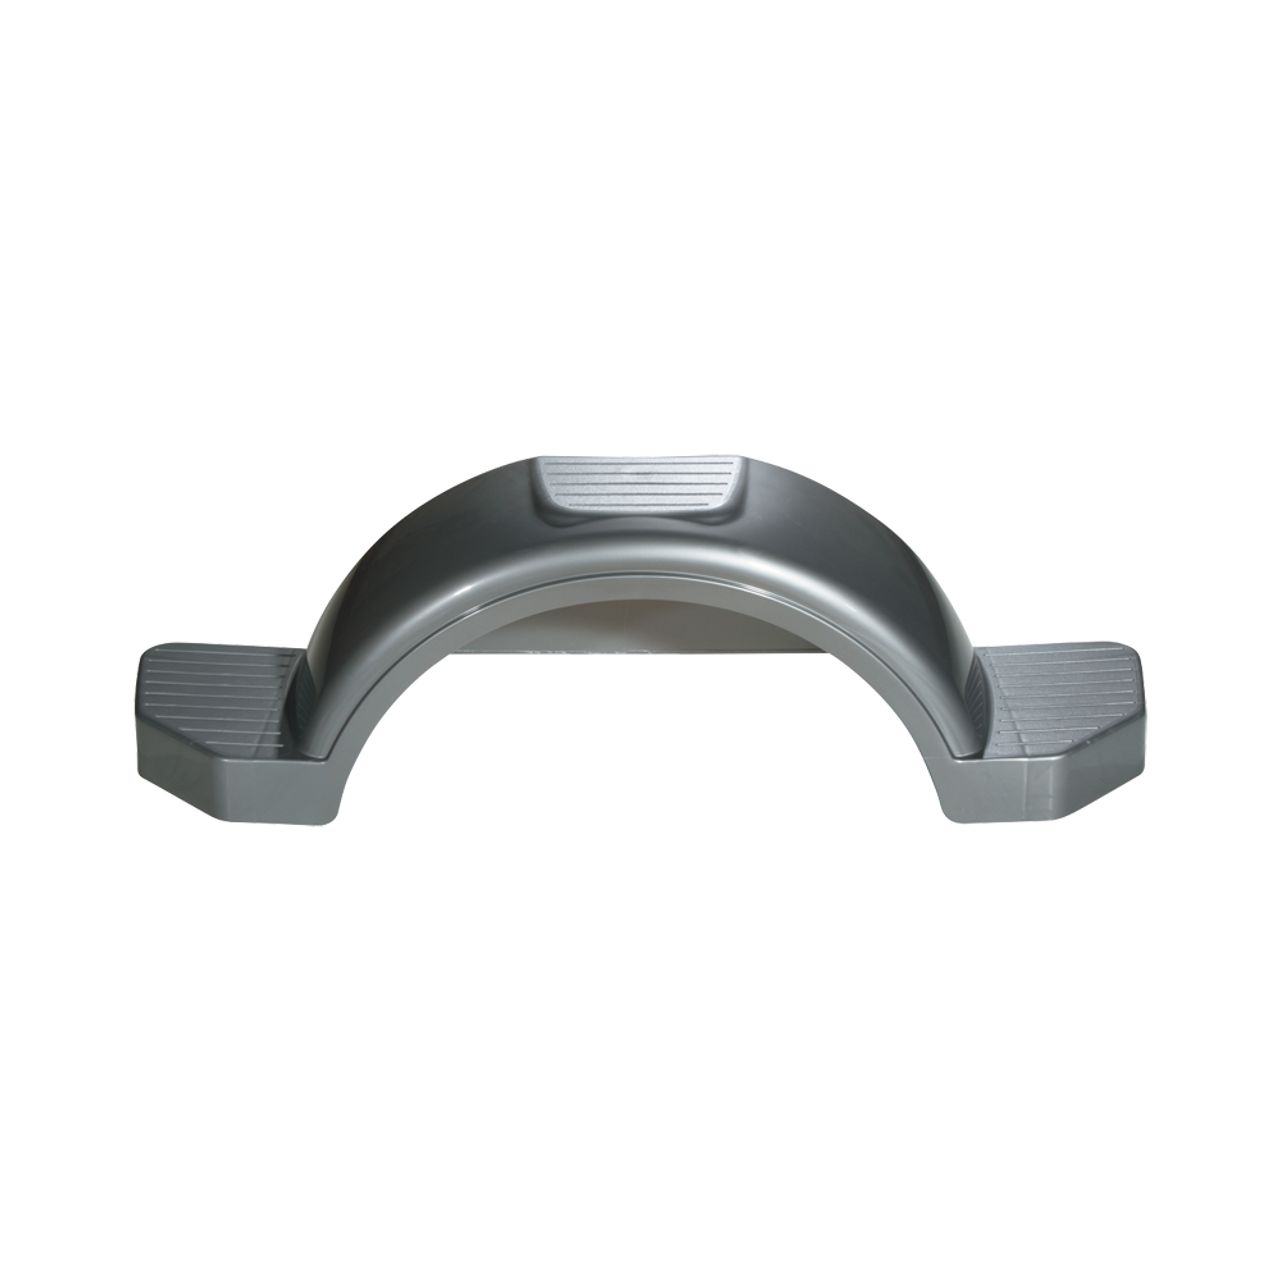 "Silver Plastic Trailer Fender - 13"" Tire Size - One Fender - 008593"